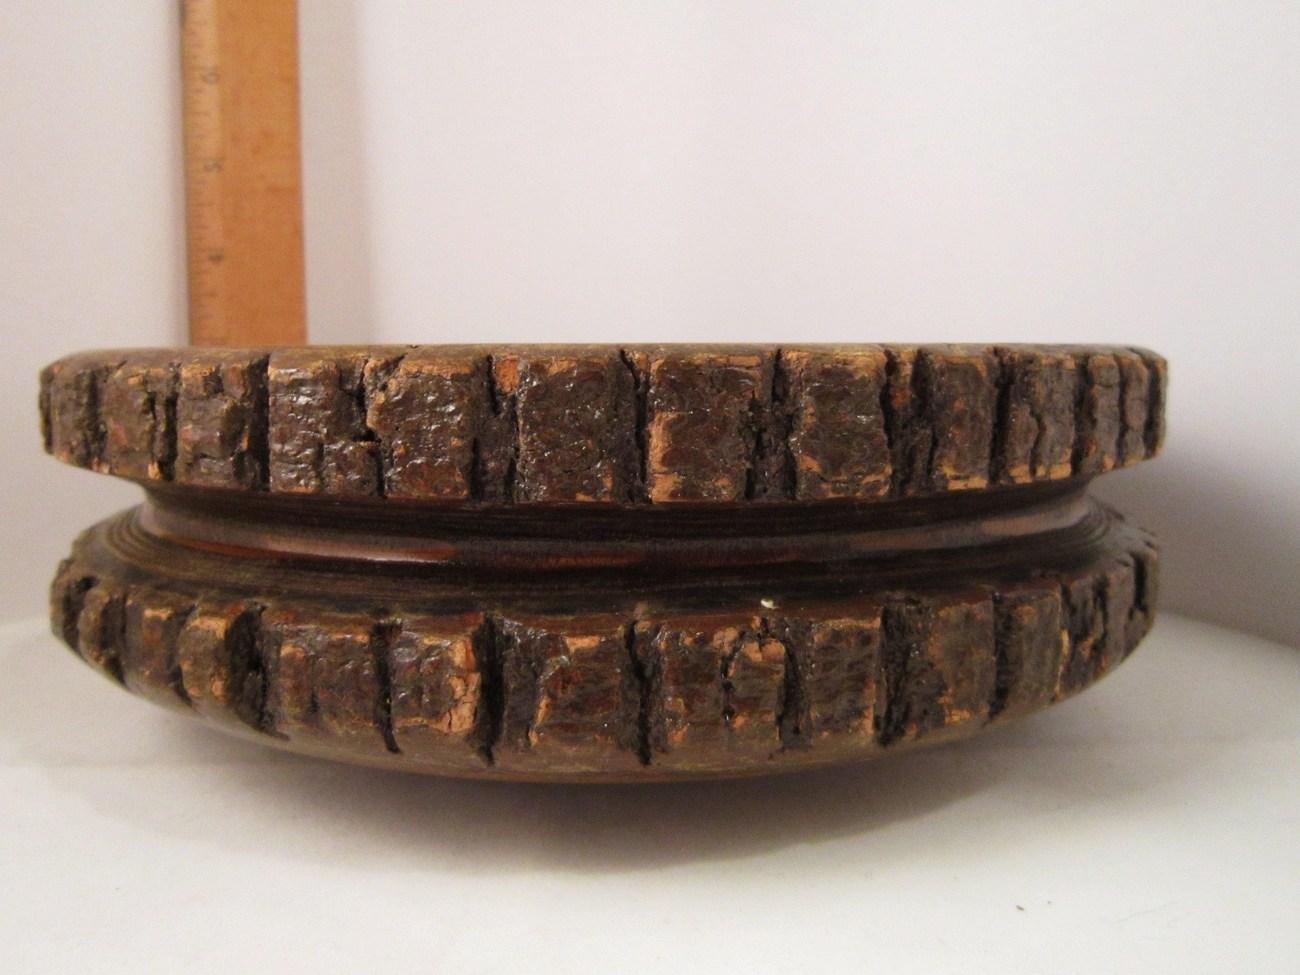 Rustic Wooden Stump Bowl, Natural Bark, Fine Grain, 9 inches across